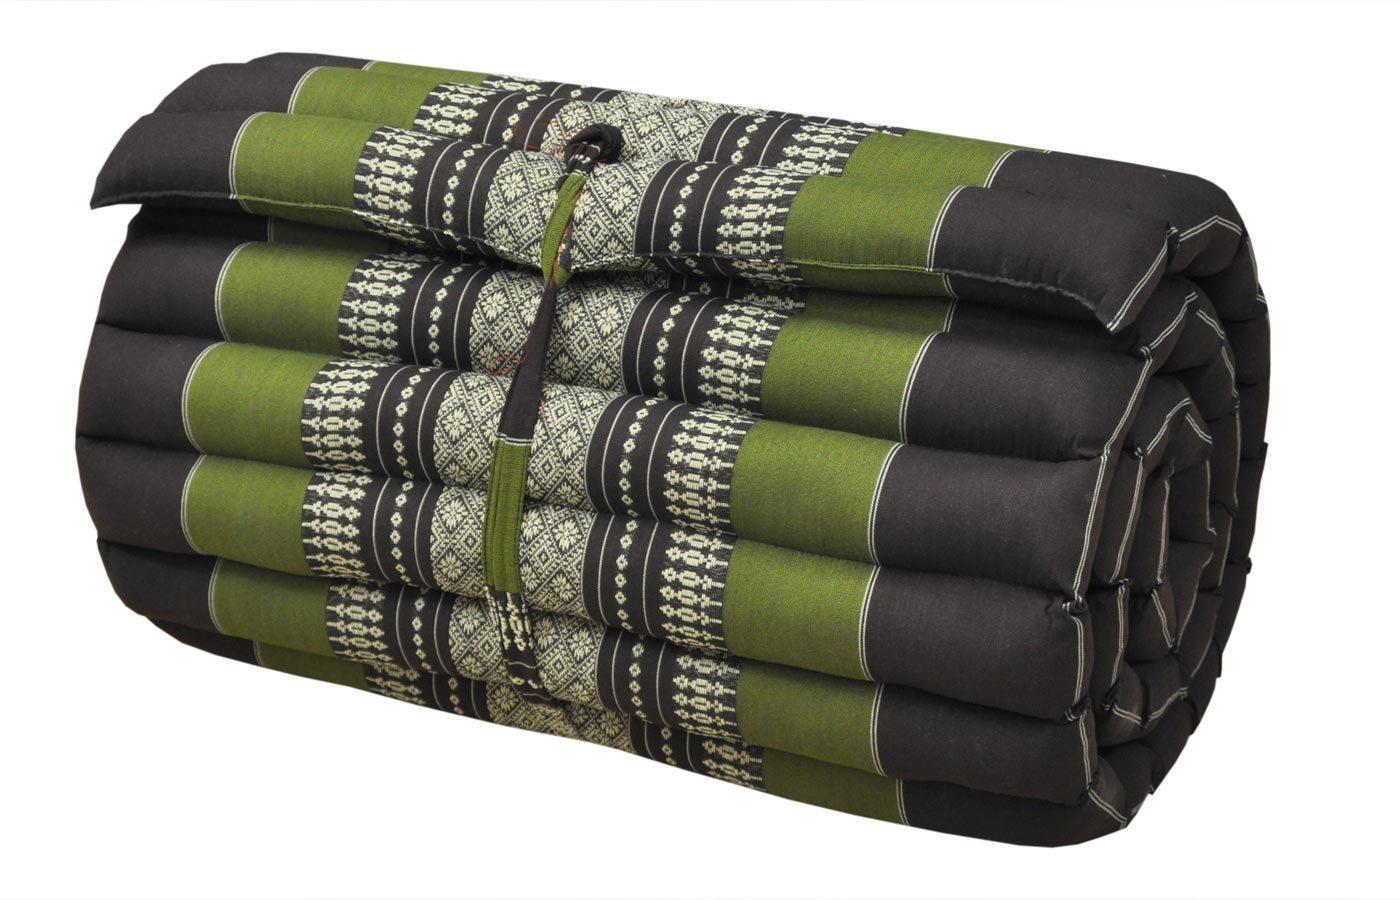 rollmatte schmal braun gr n. Black Bedroom Furniture Sets. Home Design Ideas